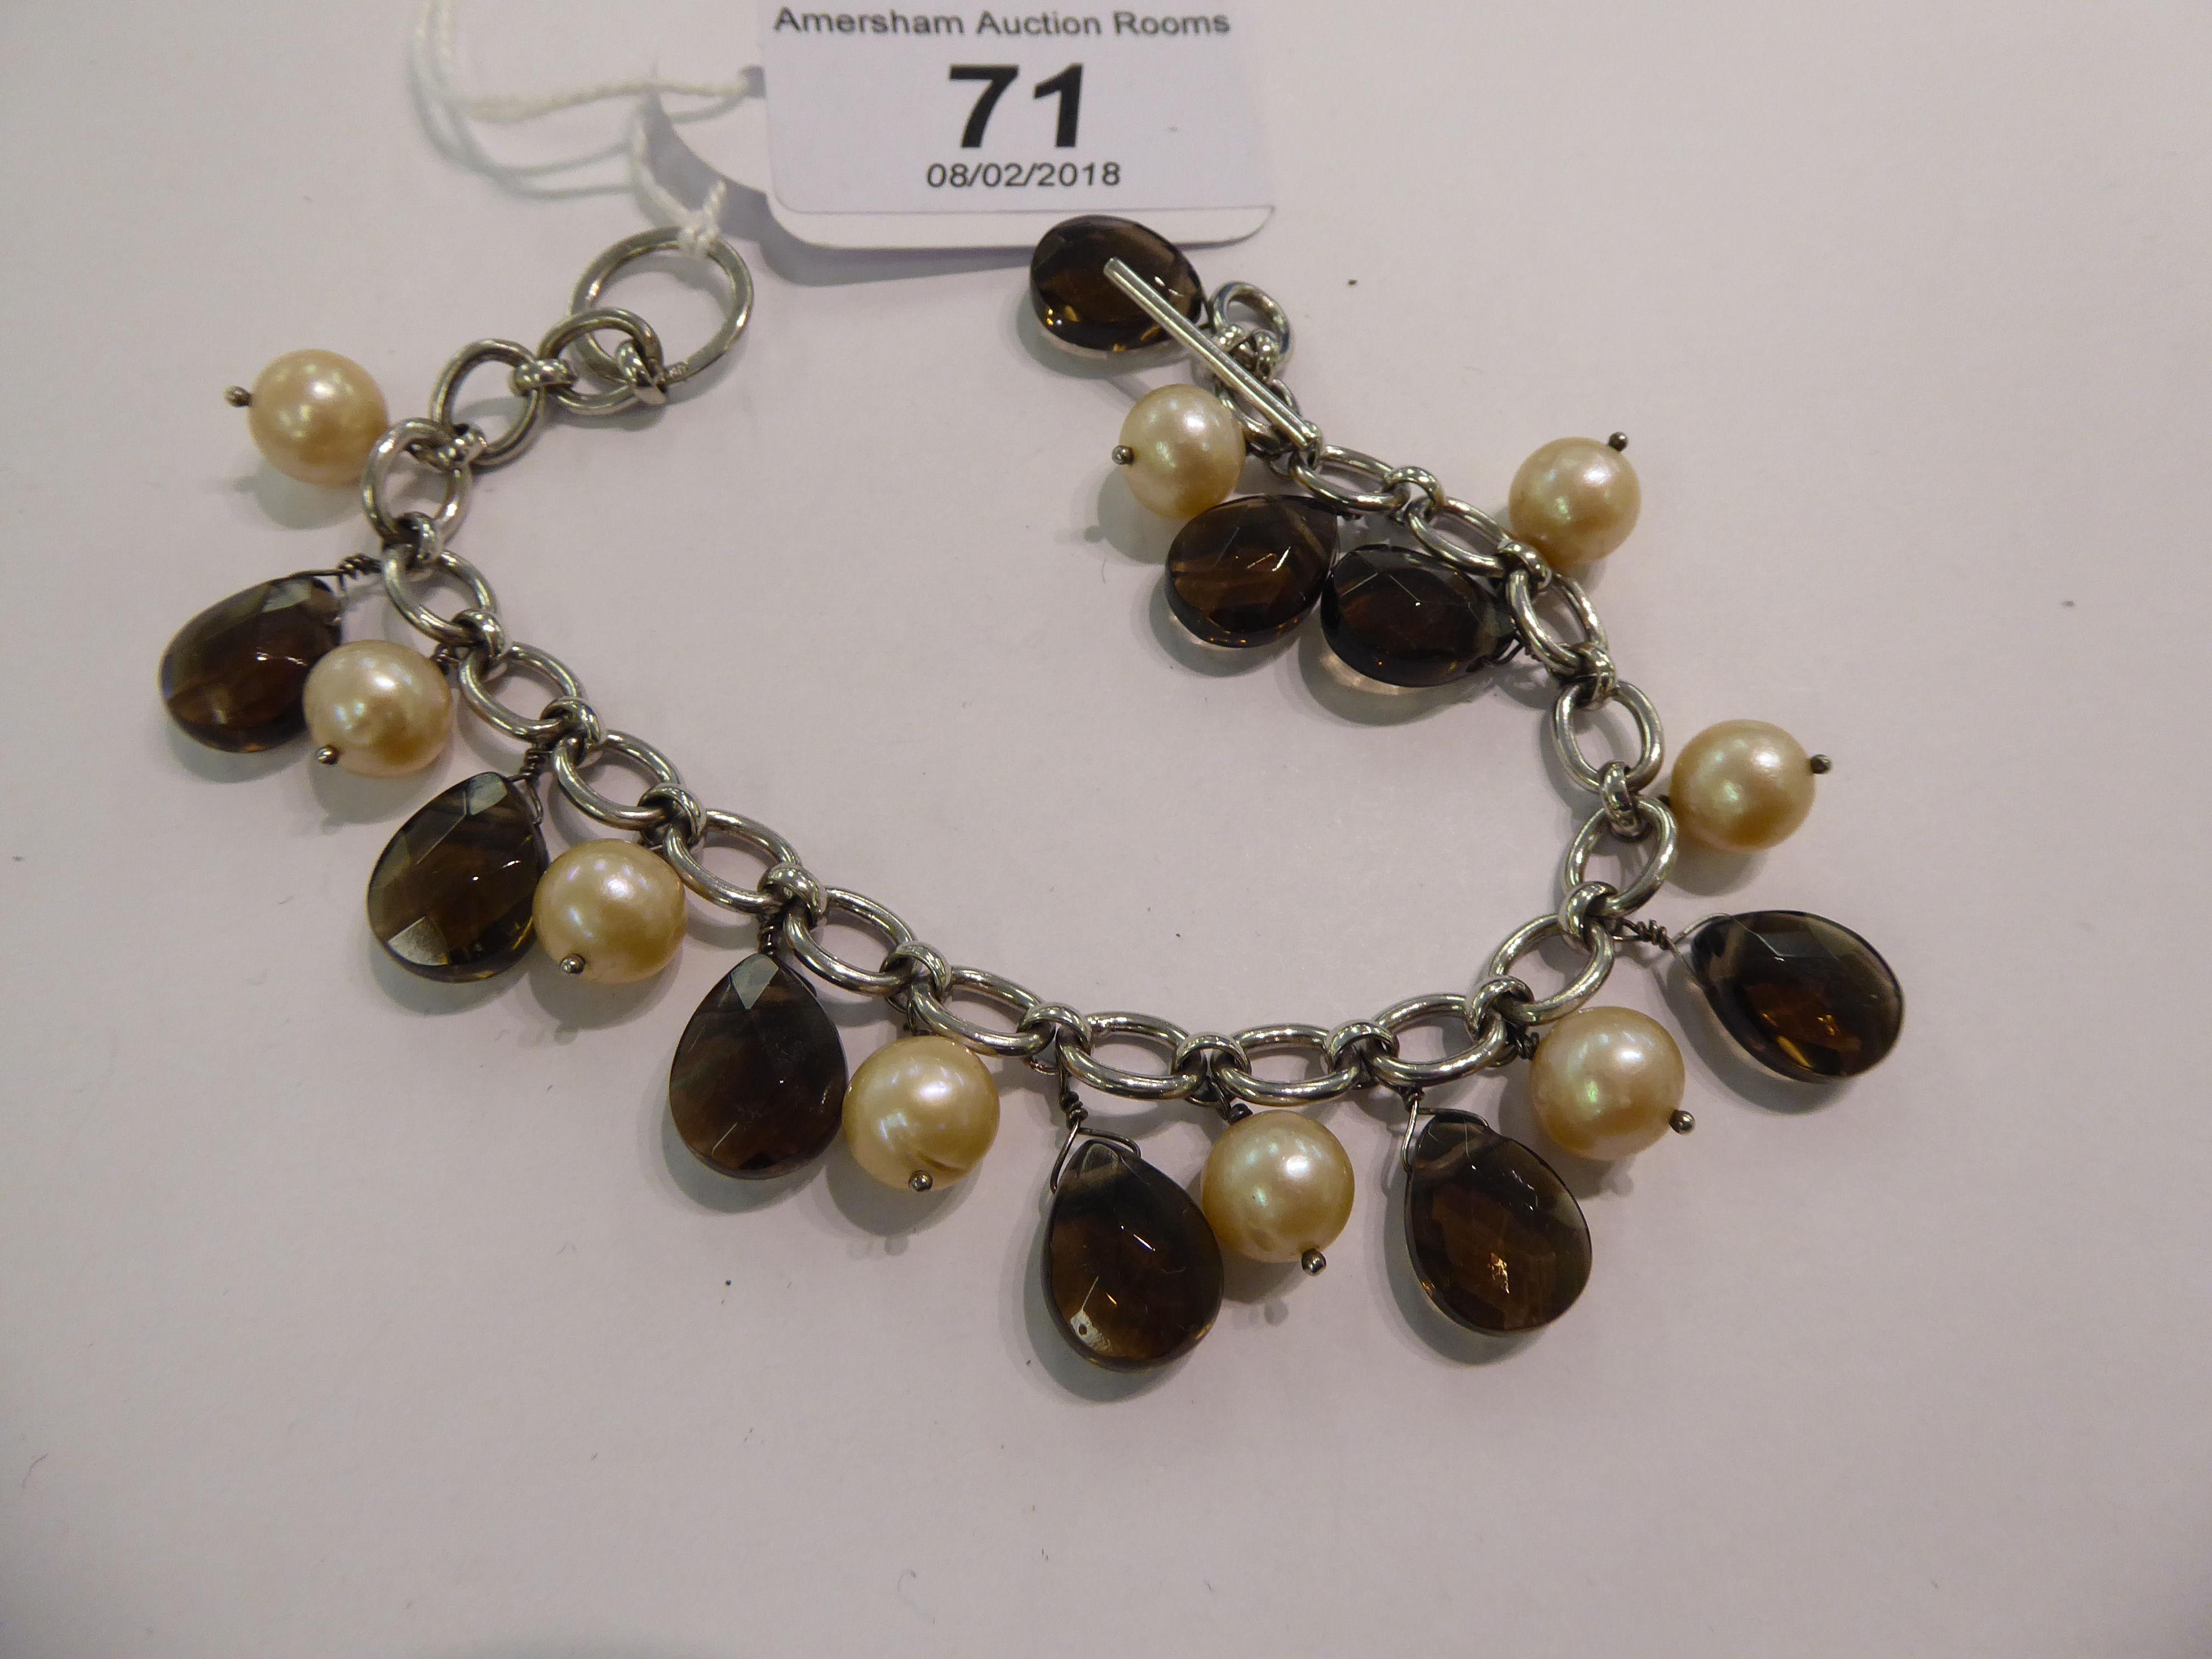 Lot 71 - A silver coloured metal bracelet stamped 925,